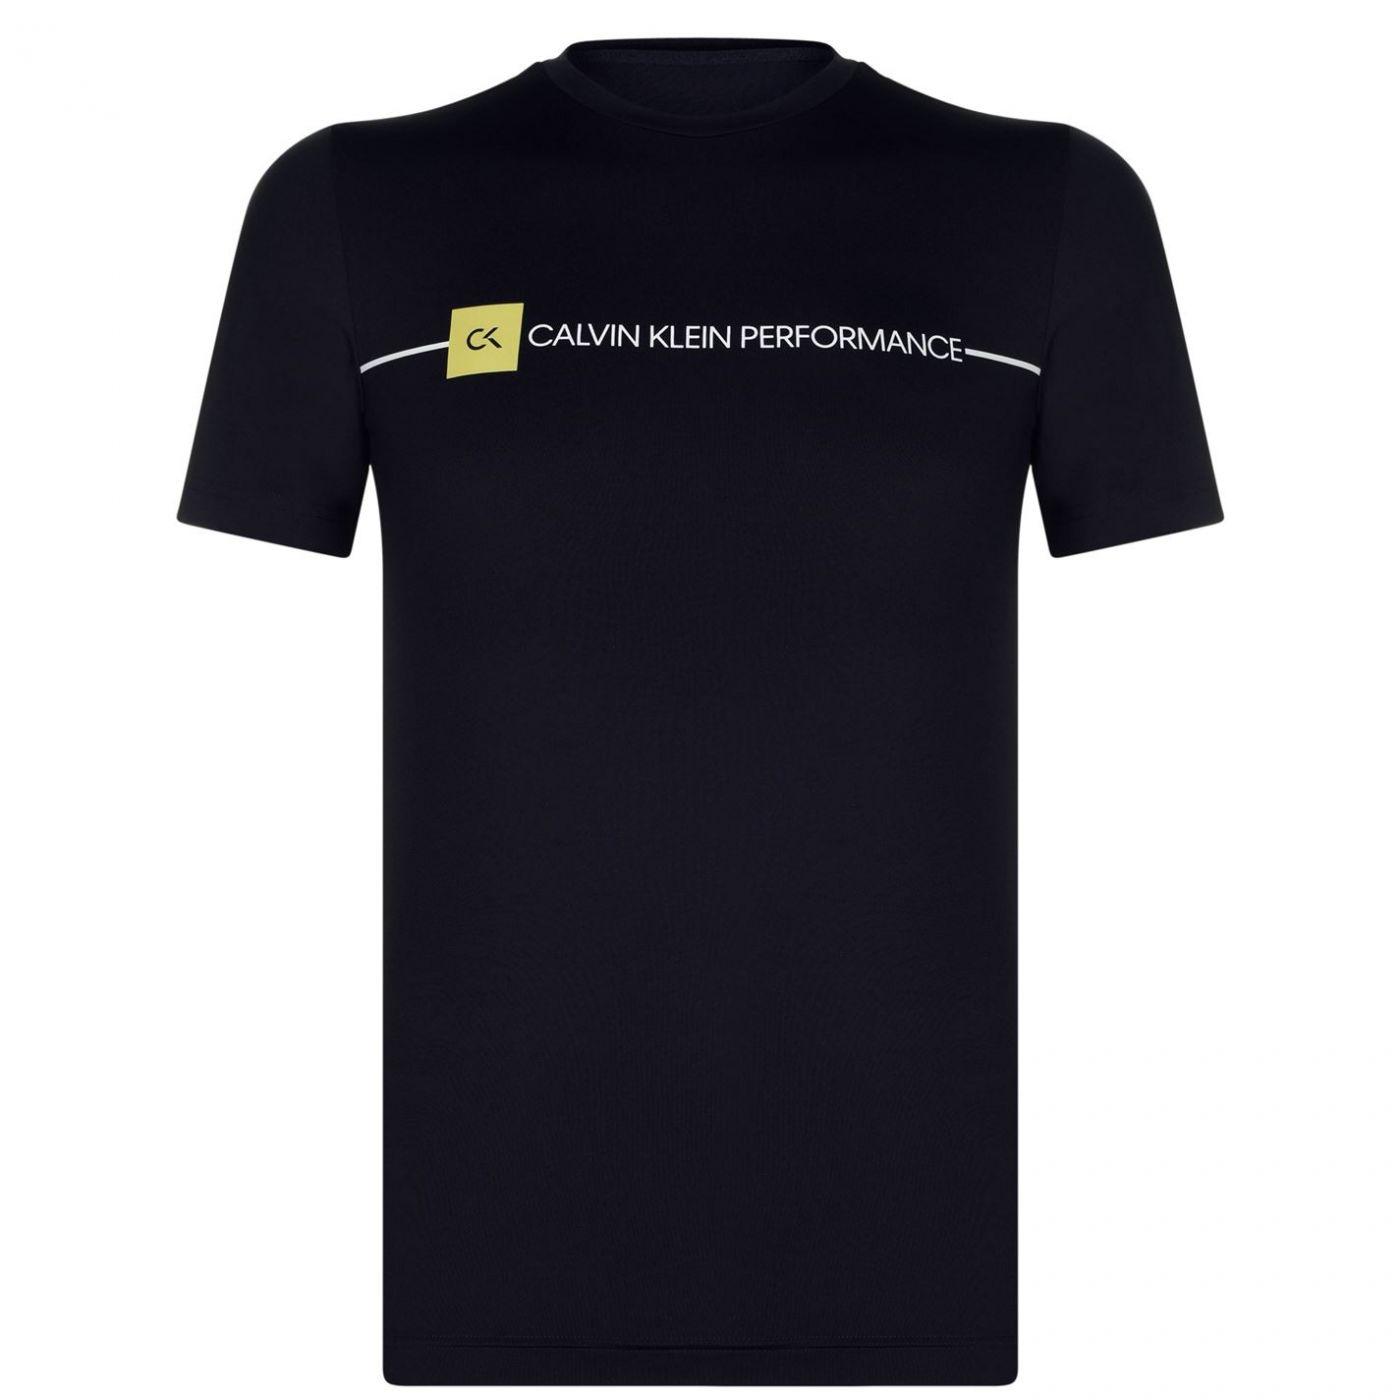 Calvin Klein Performance Short Sleeve T Shirt